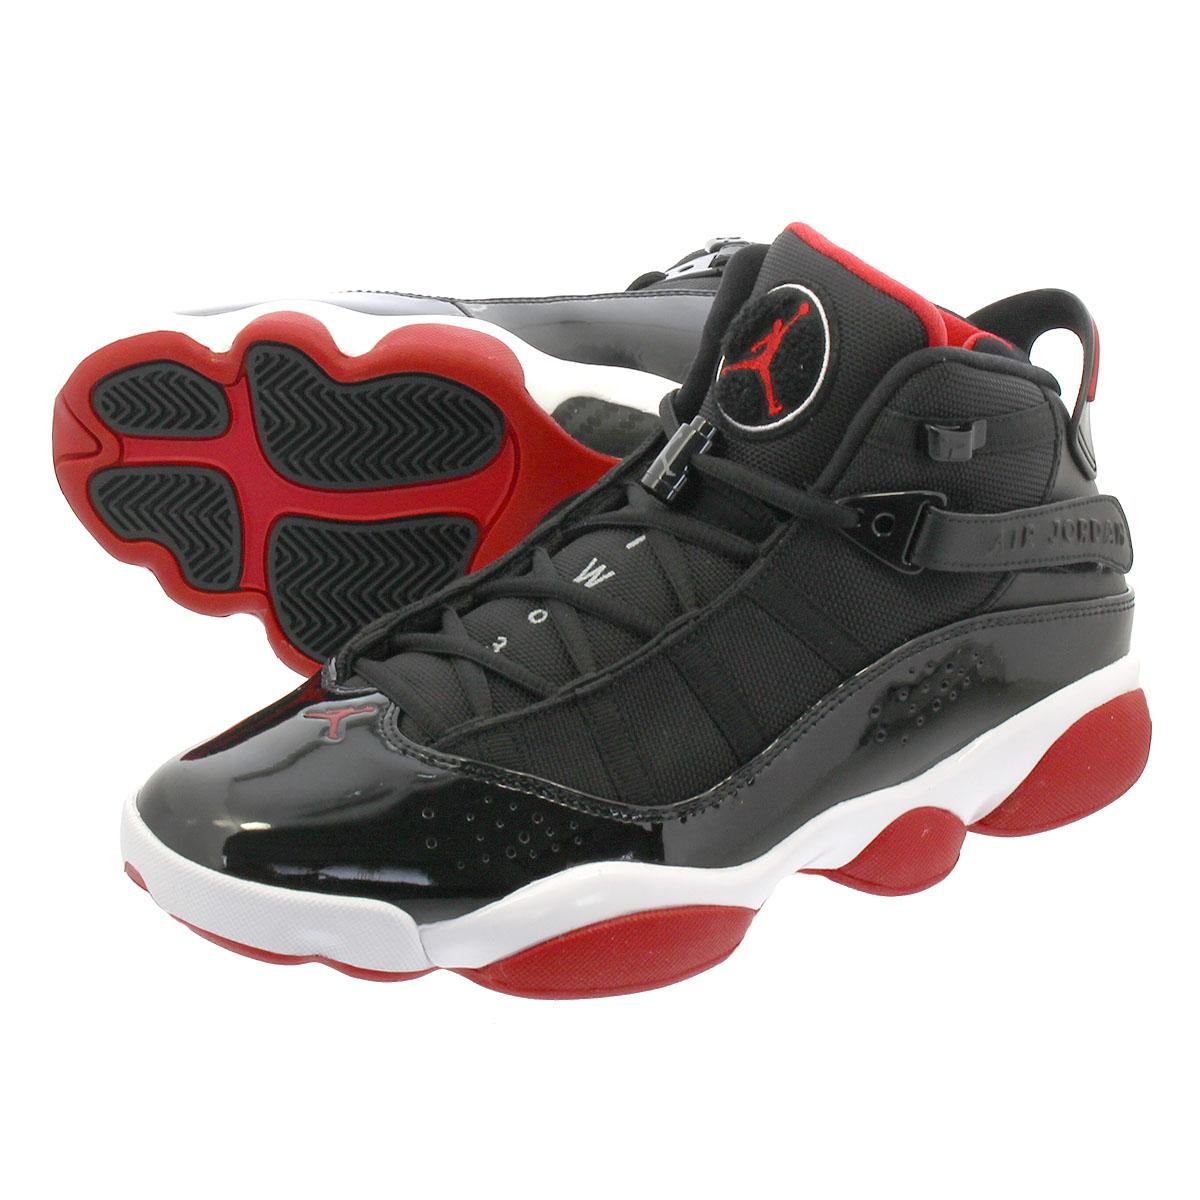 8b931c7f2d1 LOWTEX PLUS: NIKE JORDAN 6 RINGS Nike Jordan 6 RINGS Co.,Ltd. BLACK/VARSITY  RED/WHITE 322,992-062 | Rakuten Global Market